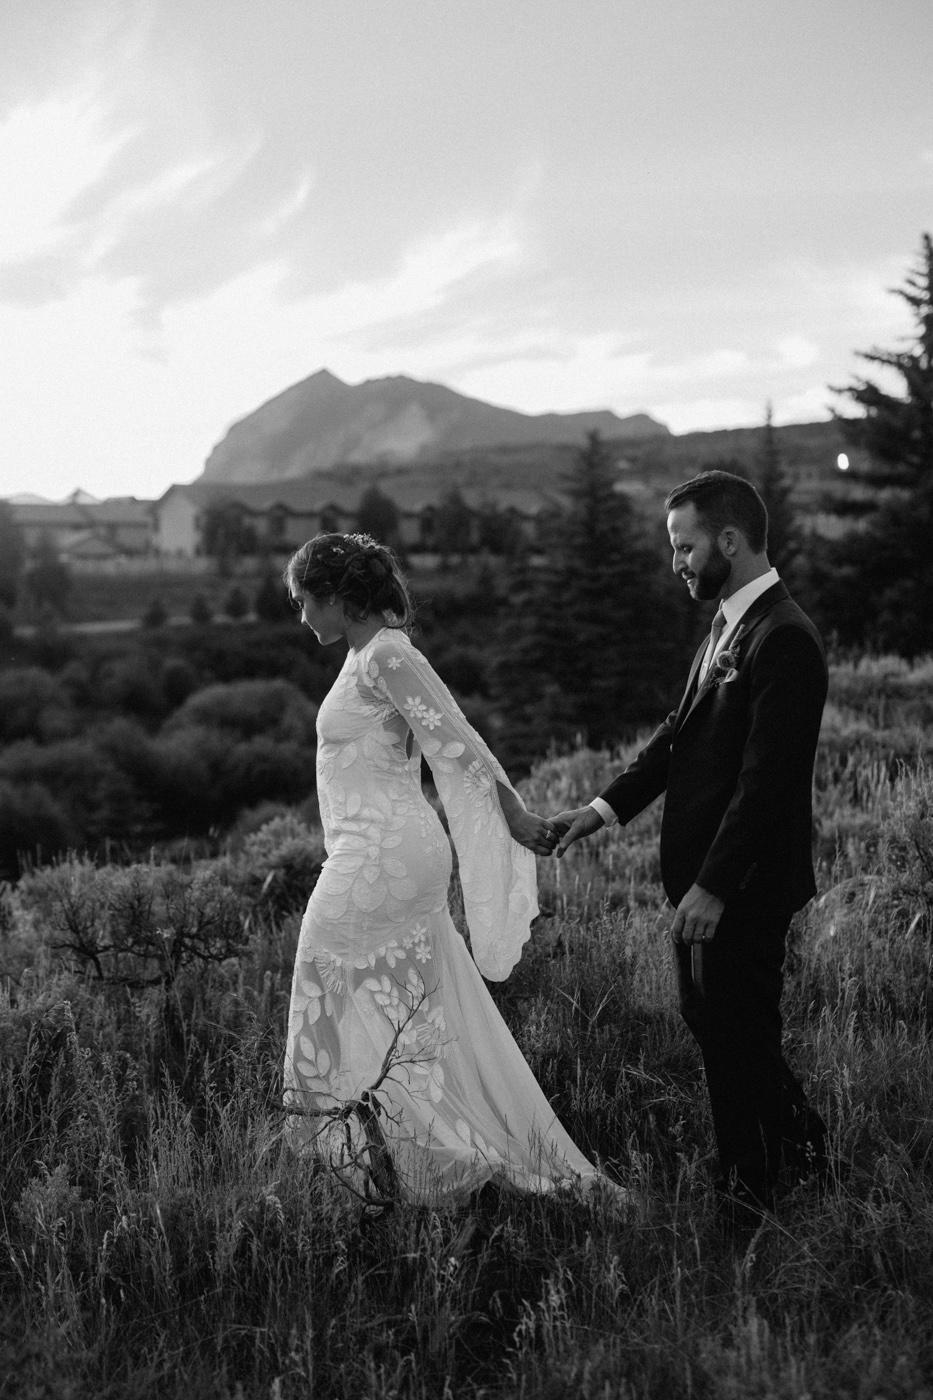 woods-walk-trail-crested-butte-colorado-wedding-128.jpg